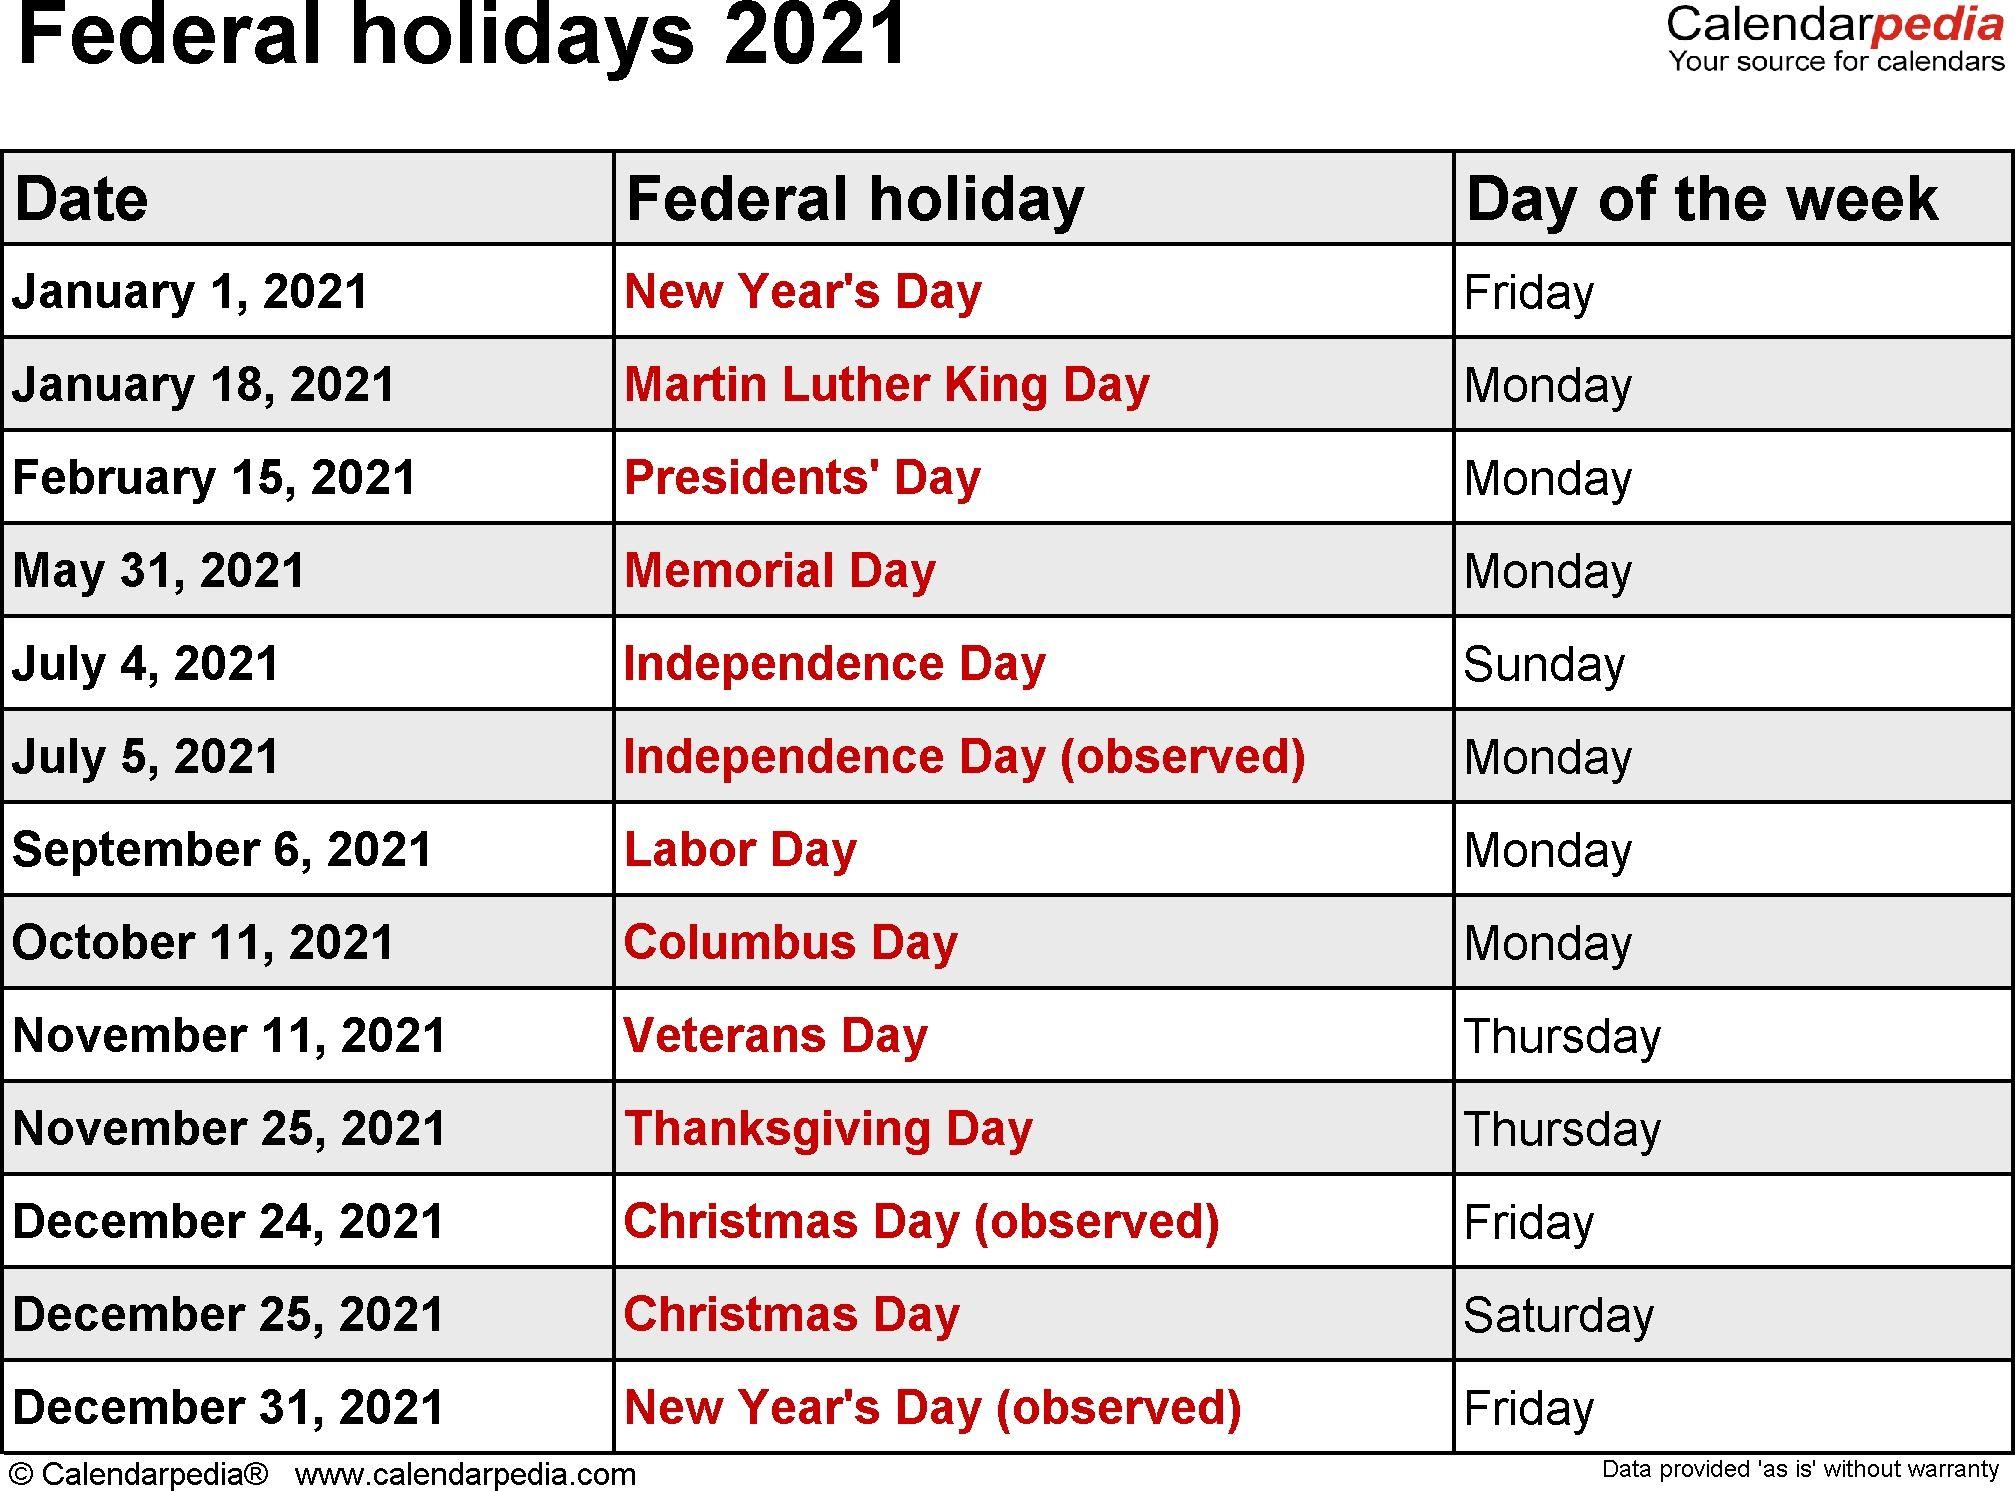 Federal Holidays 2021 Dowload | Holiday Calendar Printable regarding Printable National Day Calendar 2021